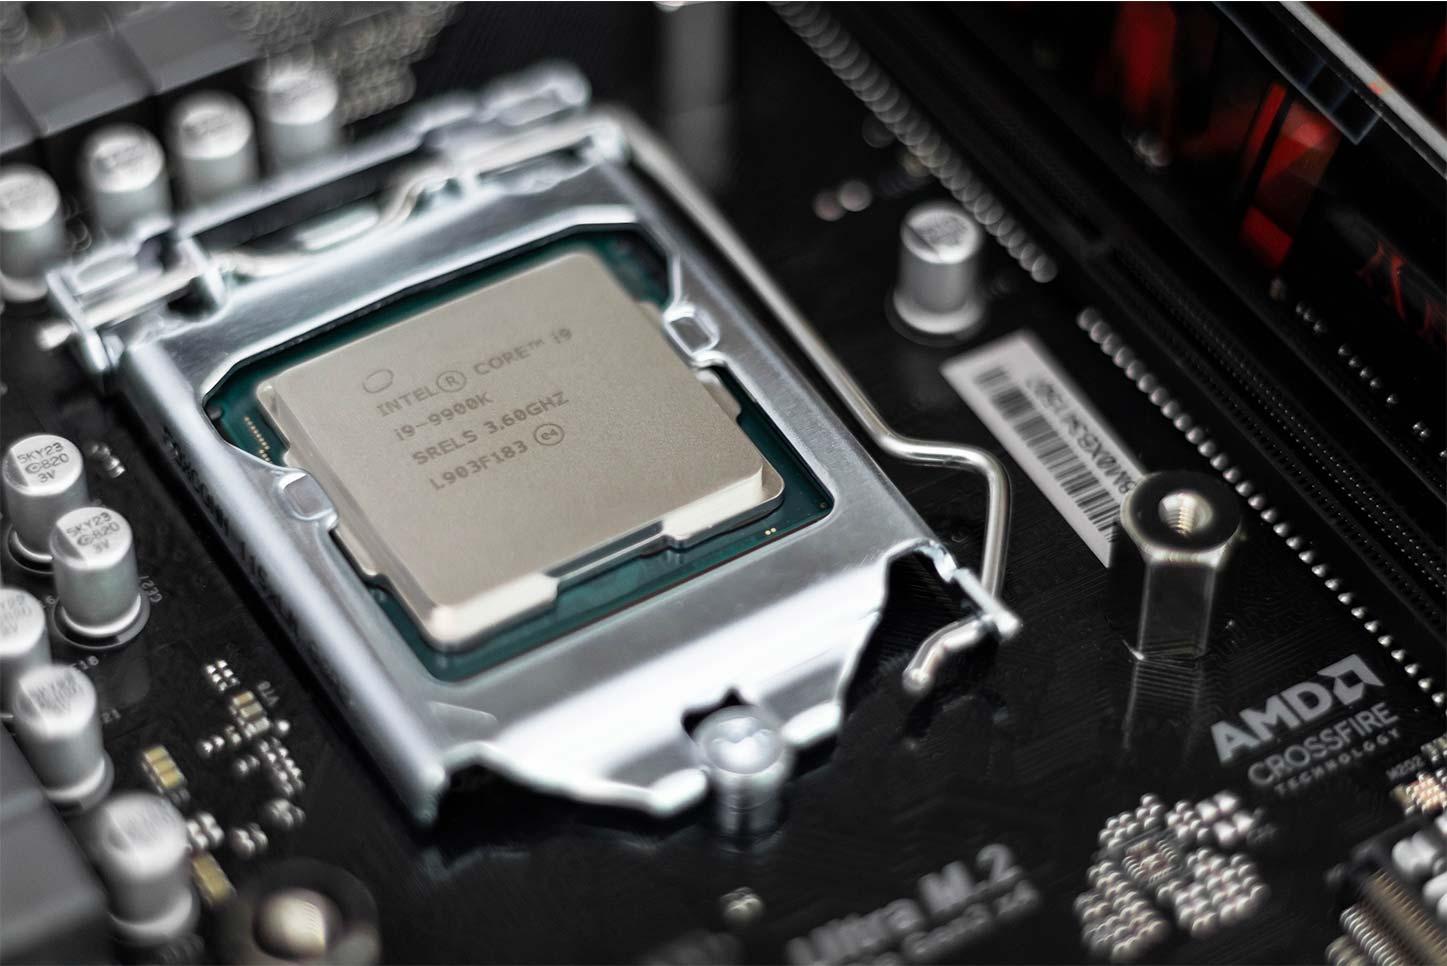 Processor chip inside of computer.